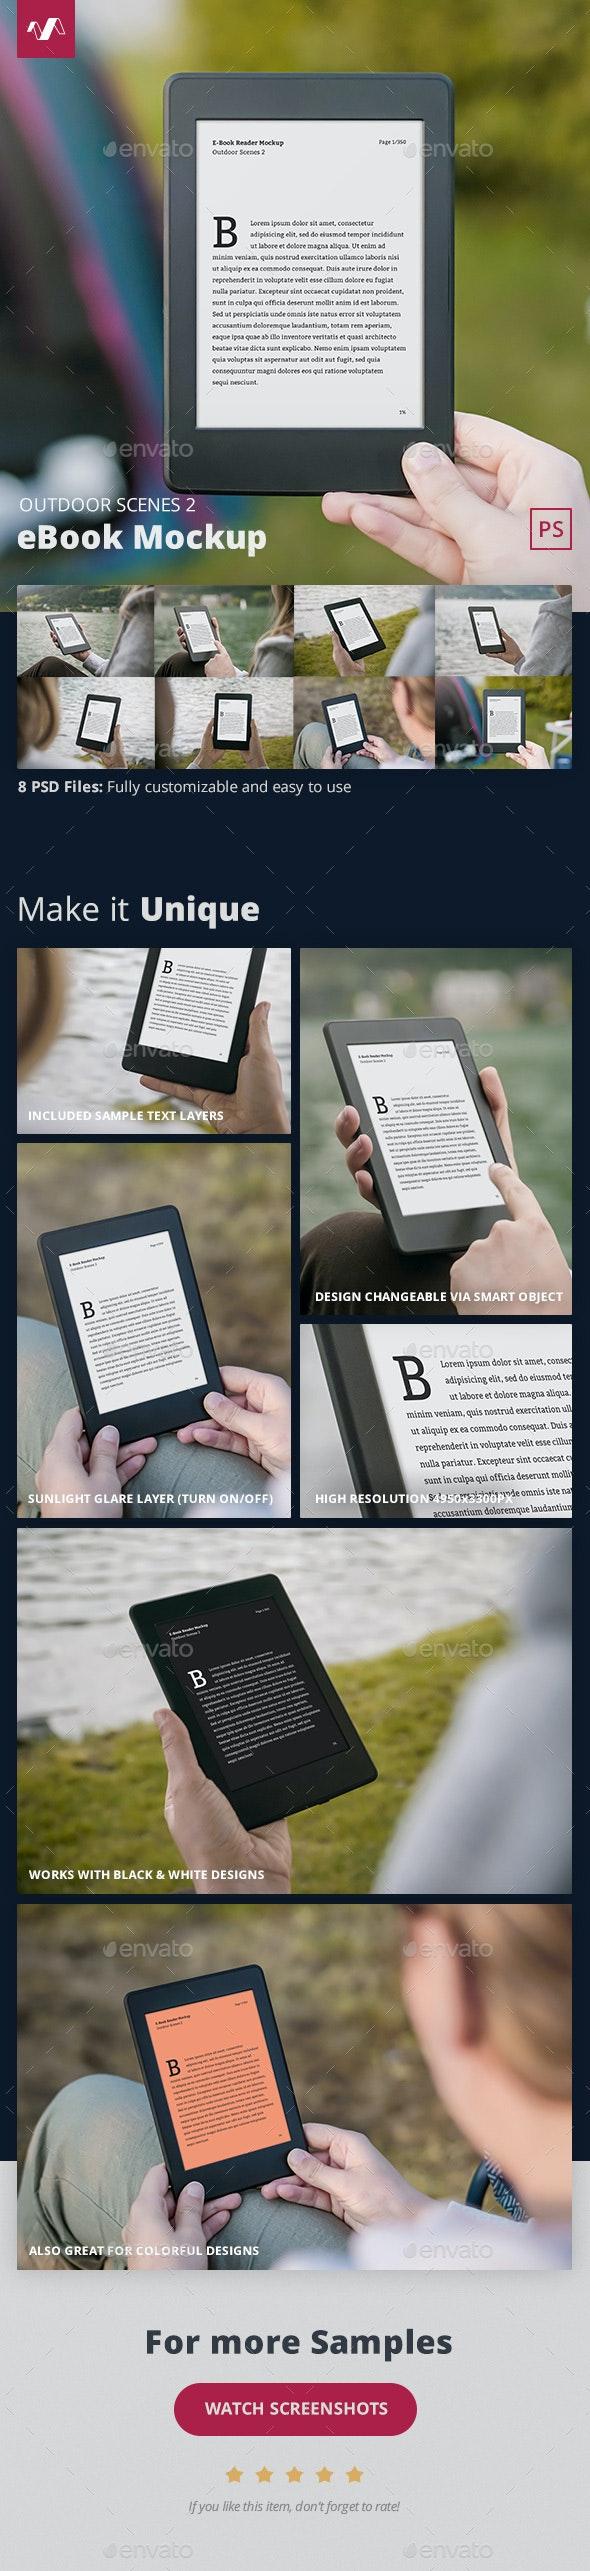 eBook Mockup Outdoor Scenes 2 - Miscellaneous Displays